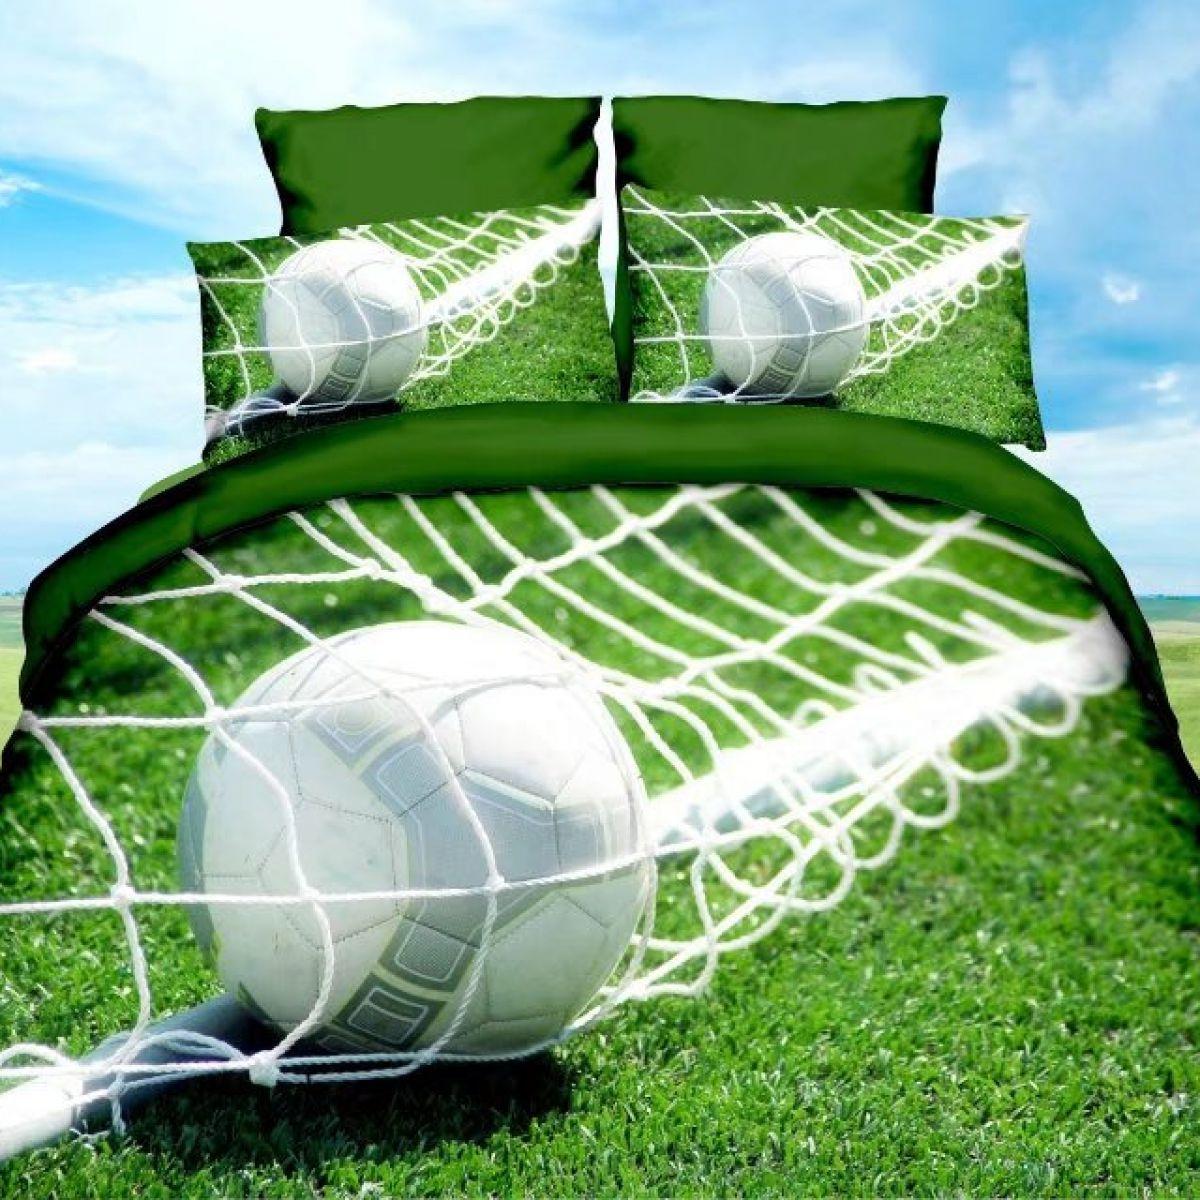 3D Beddings - Antonio - AML-41 - 160x200 cm - 4 pcs